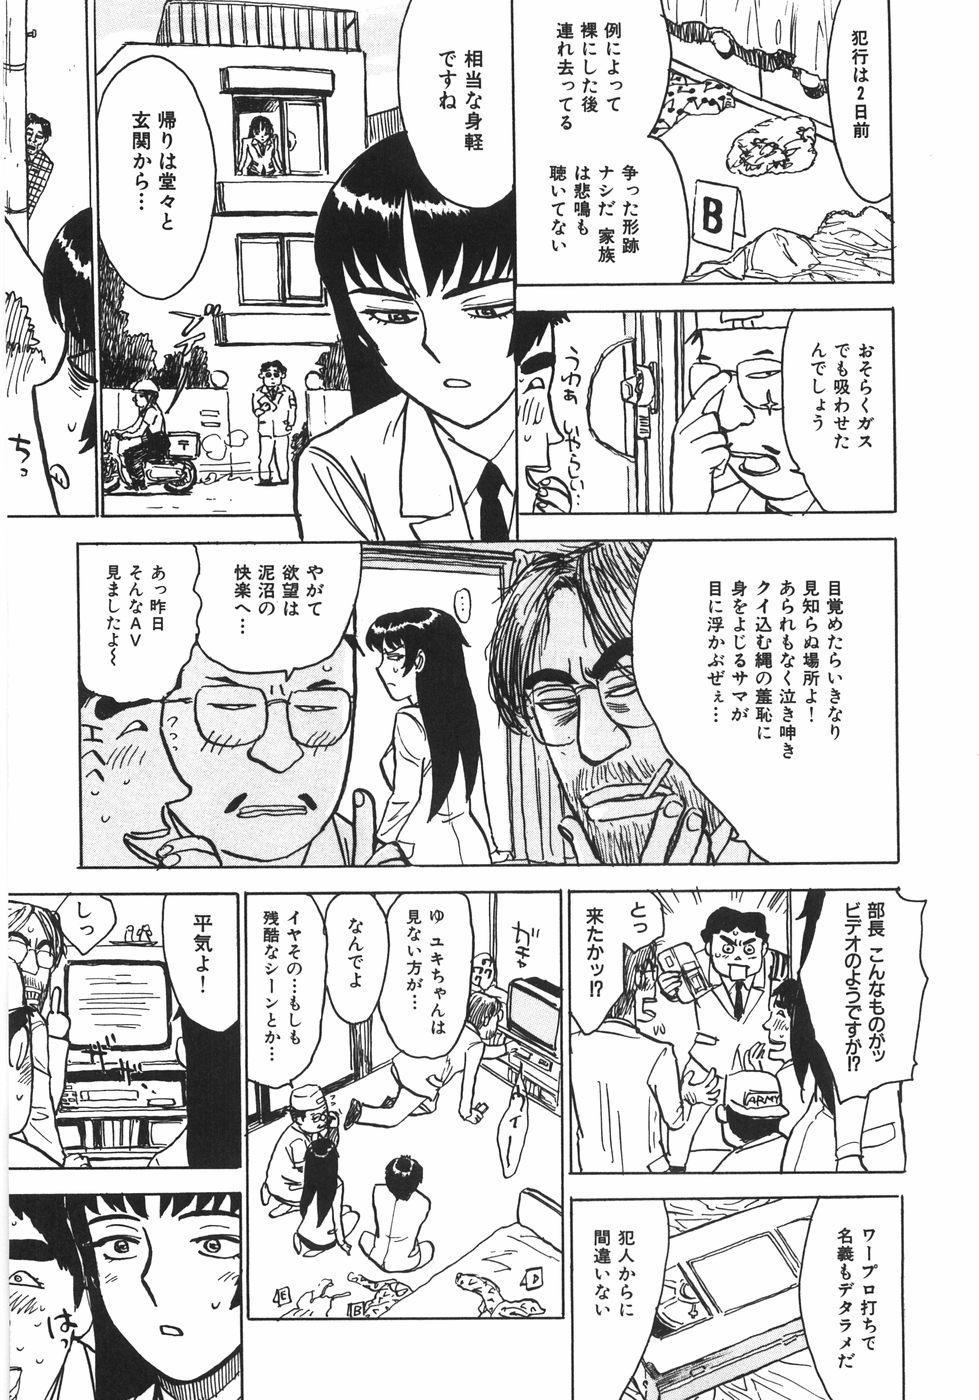 Ningyou no Yakata - The Doll House 157